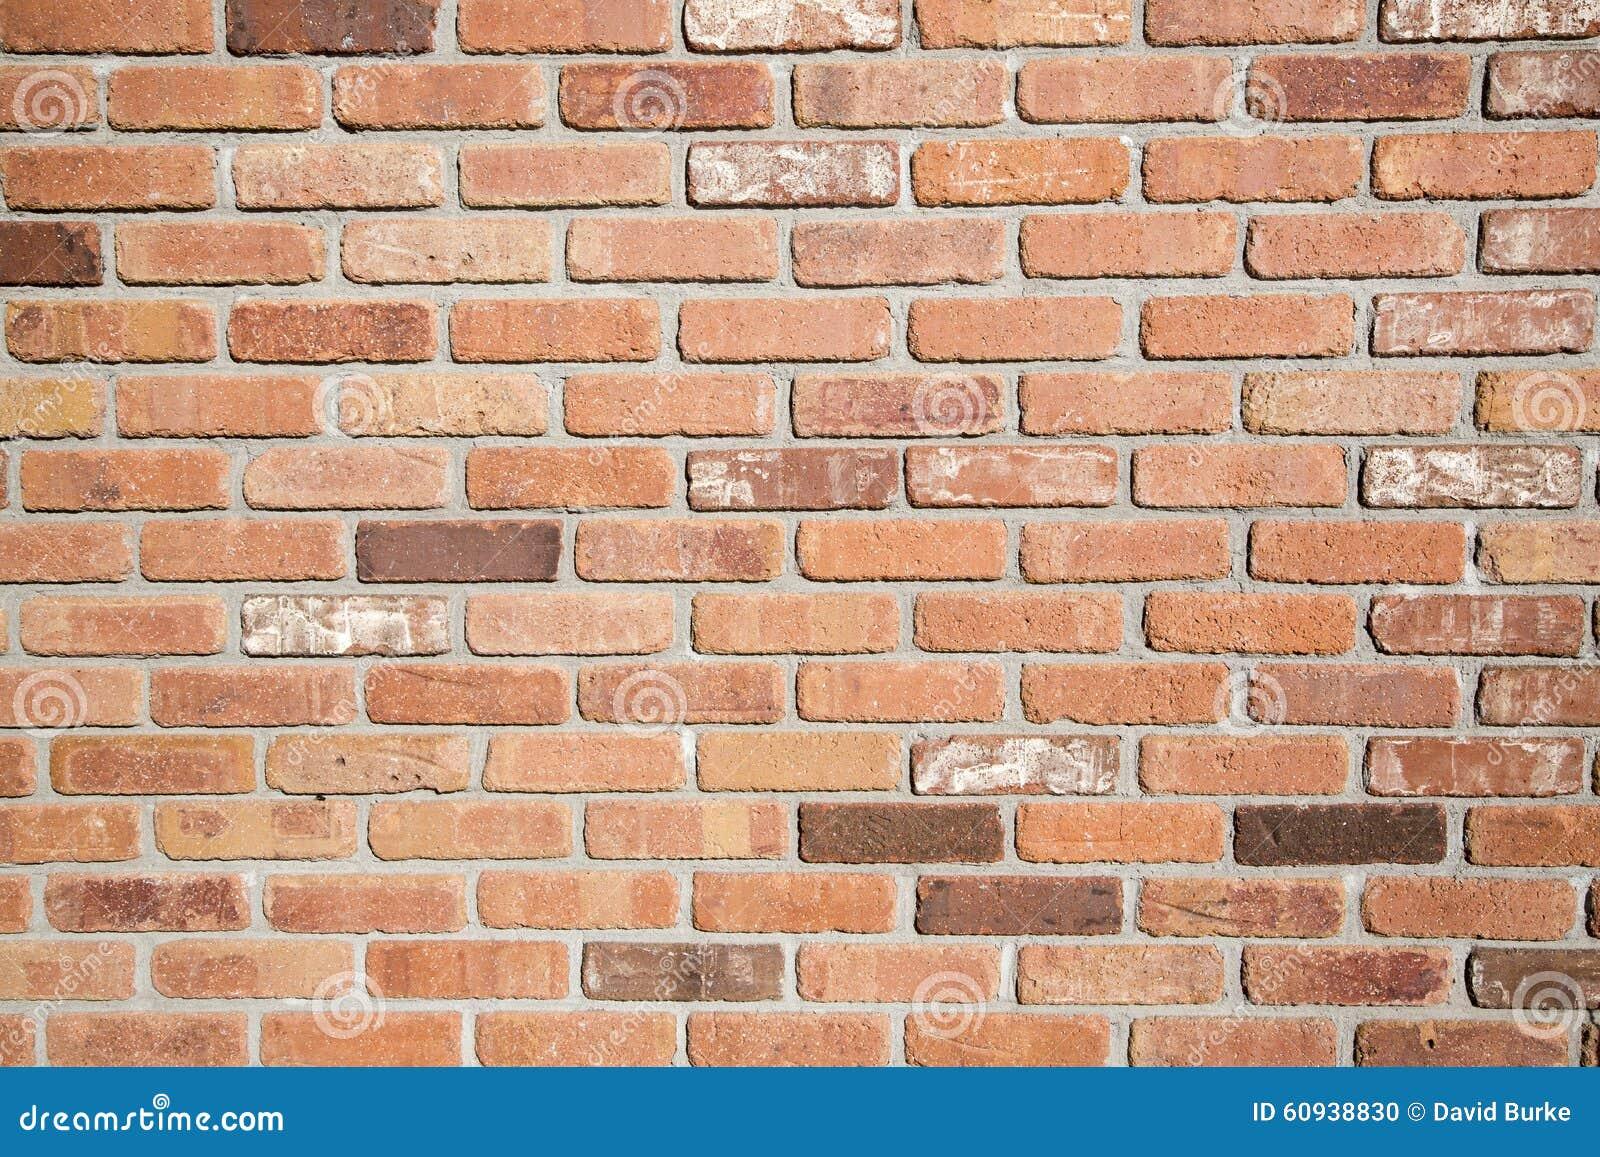 Old Brick Wall Stock Photo Image 60938830